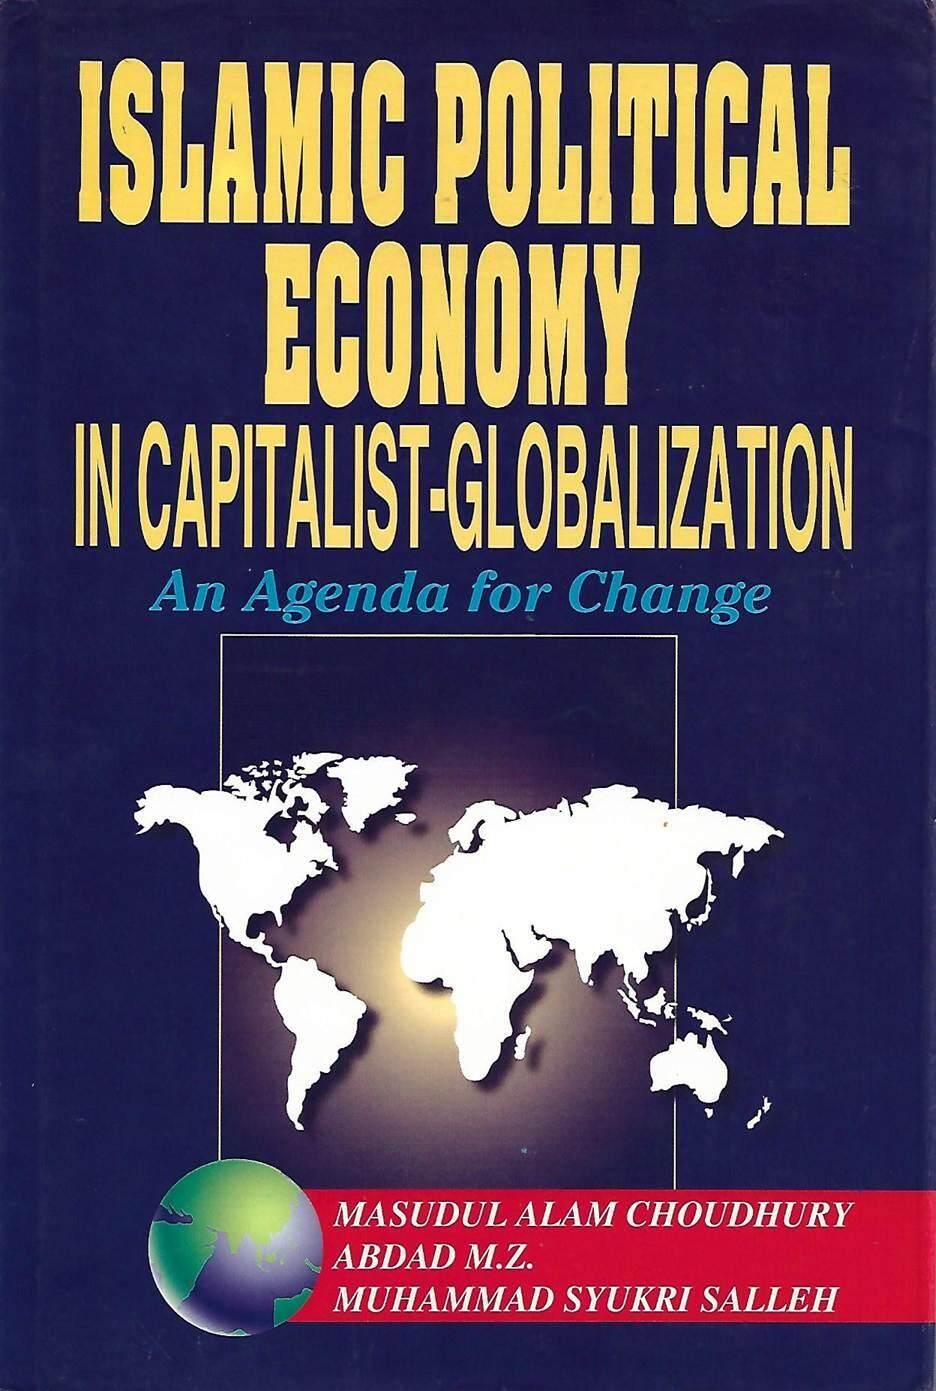 Islamic Political Economy In Capitalist-Globalization